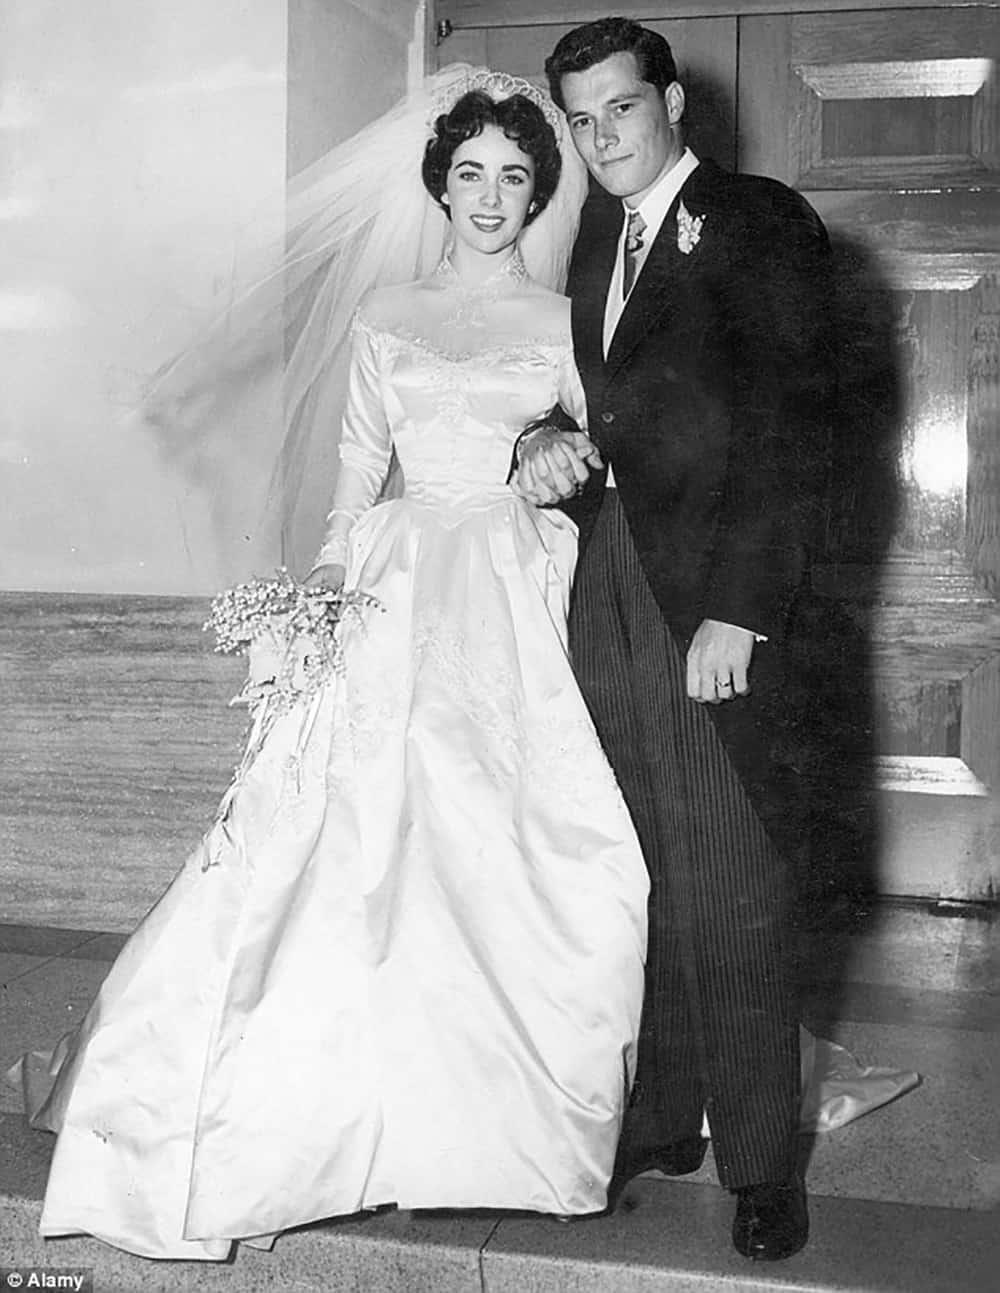 Wedding of Elizabeth Taylor.